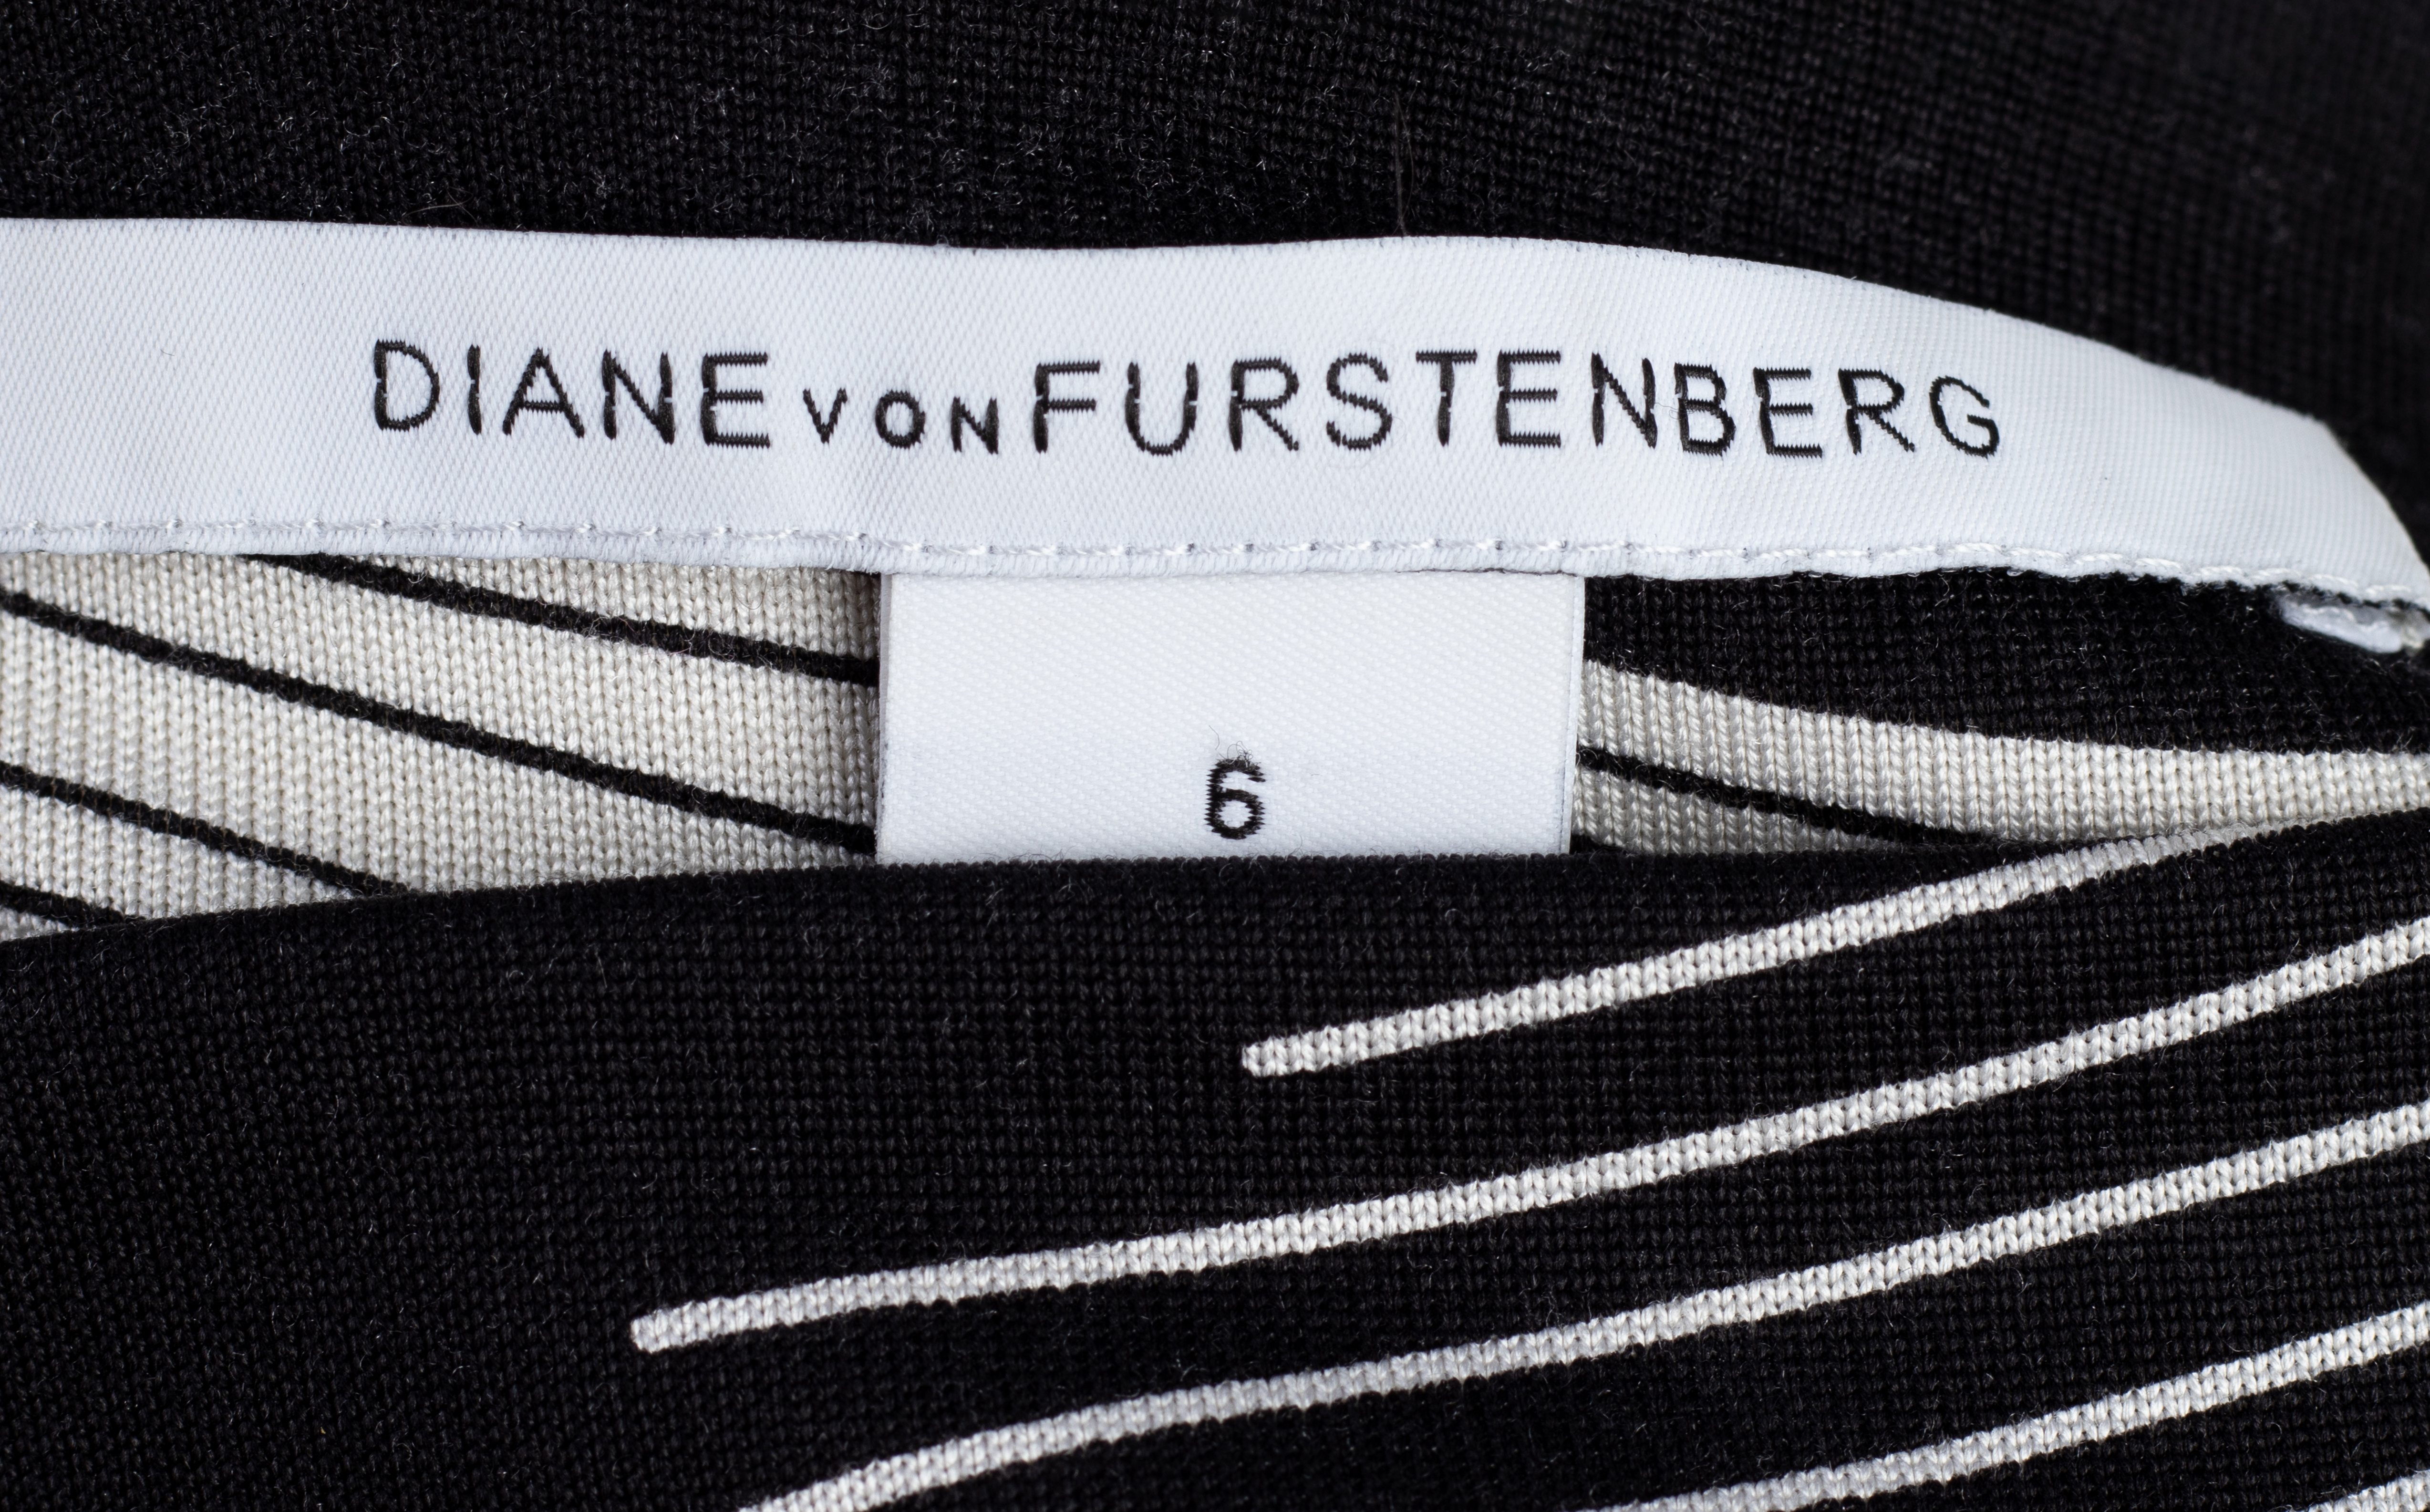 A DIANE VON FURSTENBERG BLACK & WHITE LONG SLEEVE DRESS - Image 3 of 3